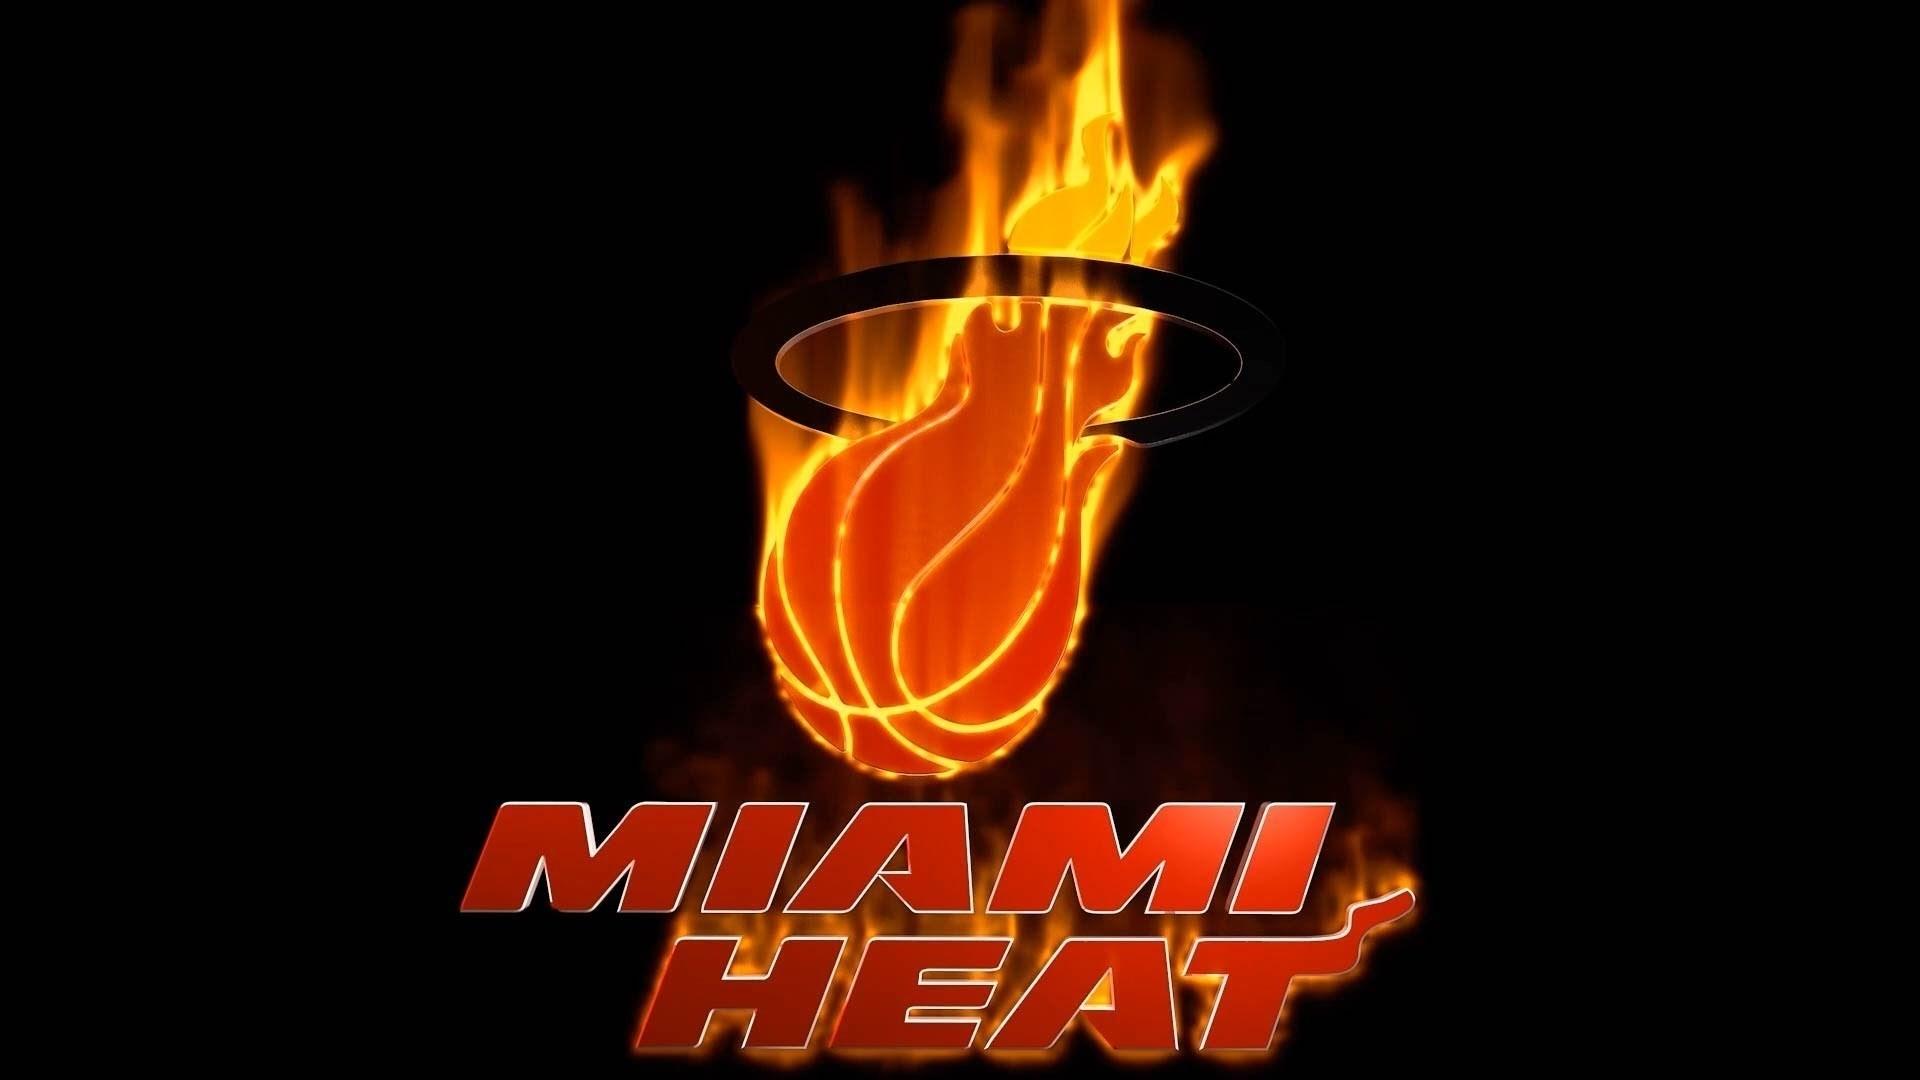 Miami Heat Wallpaper